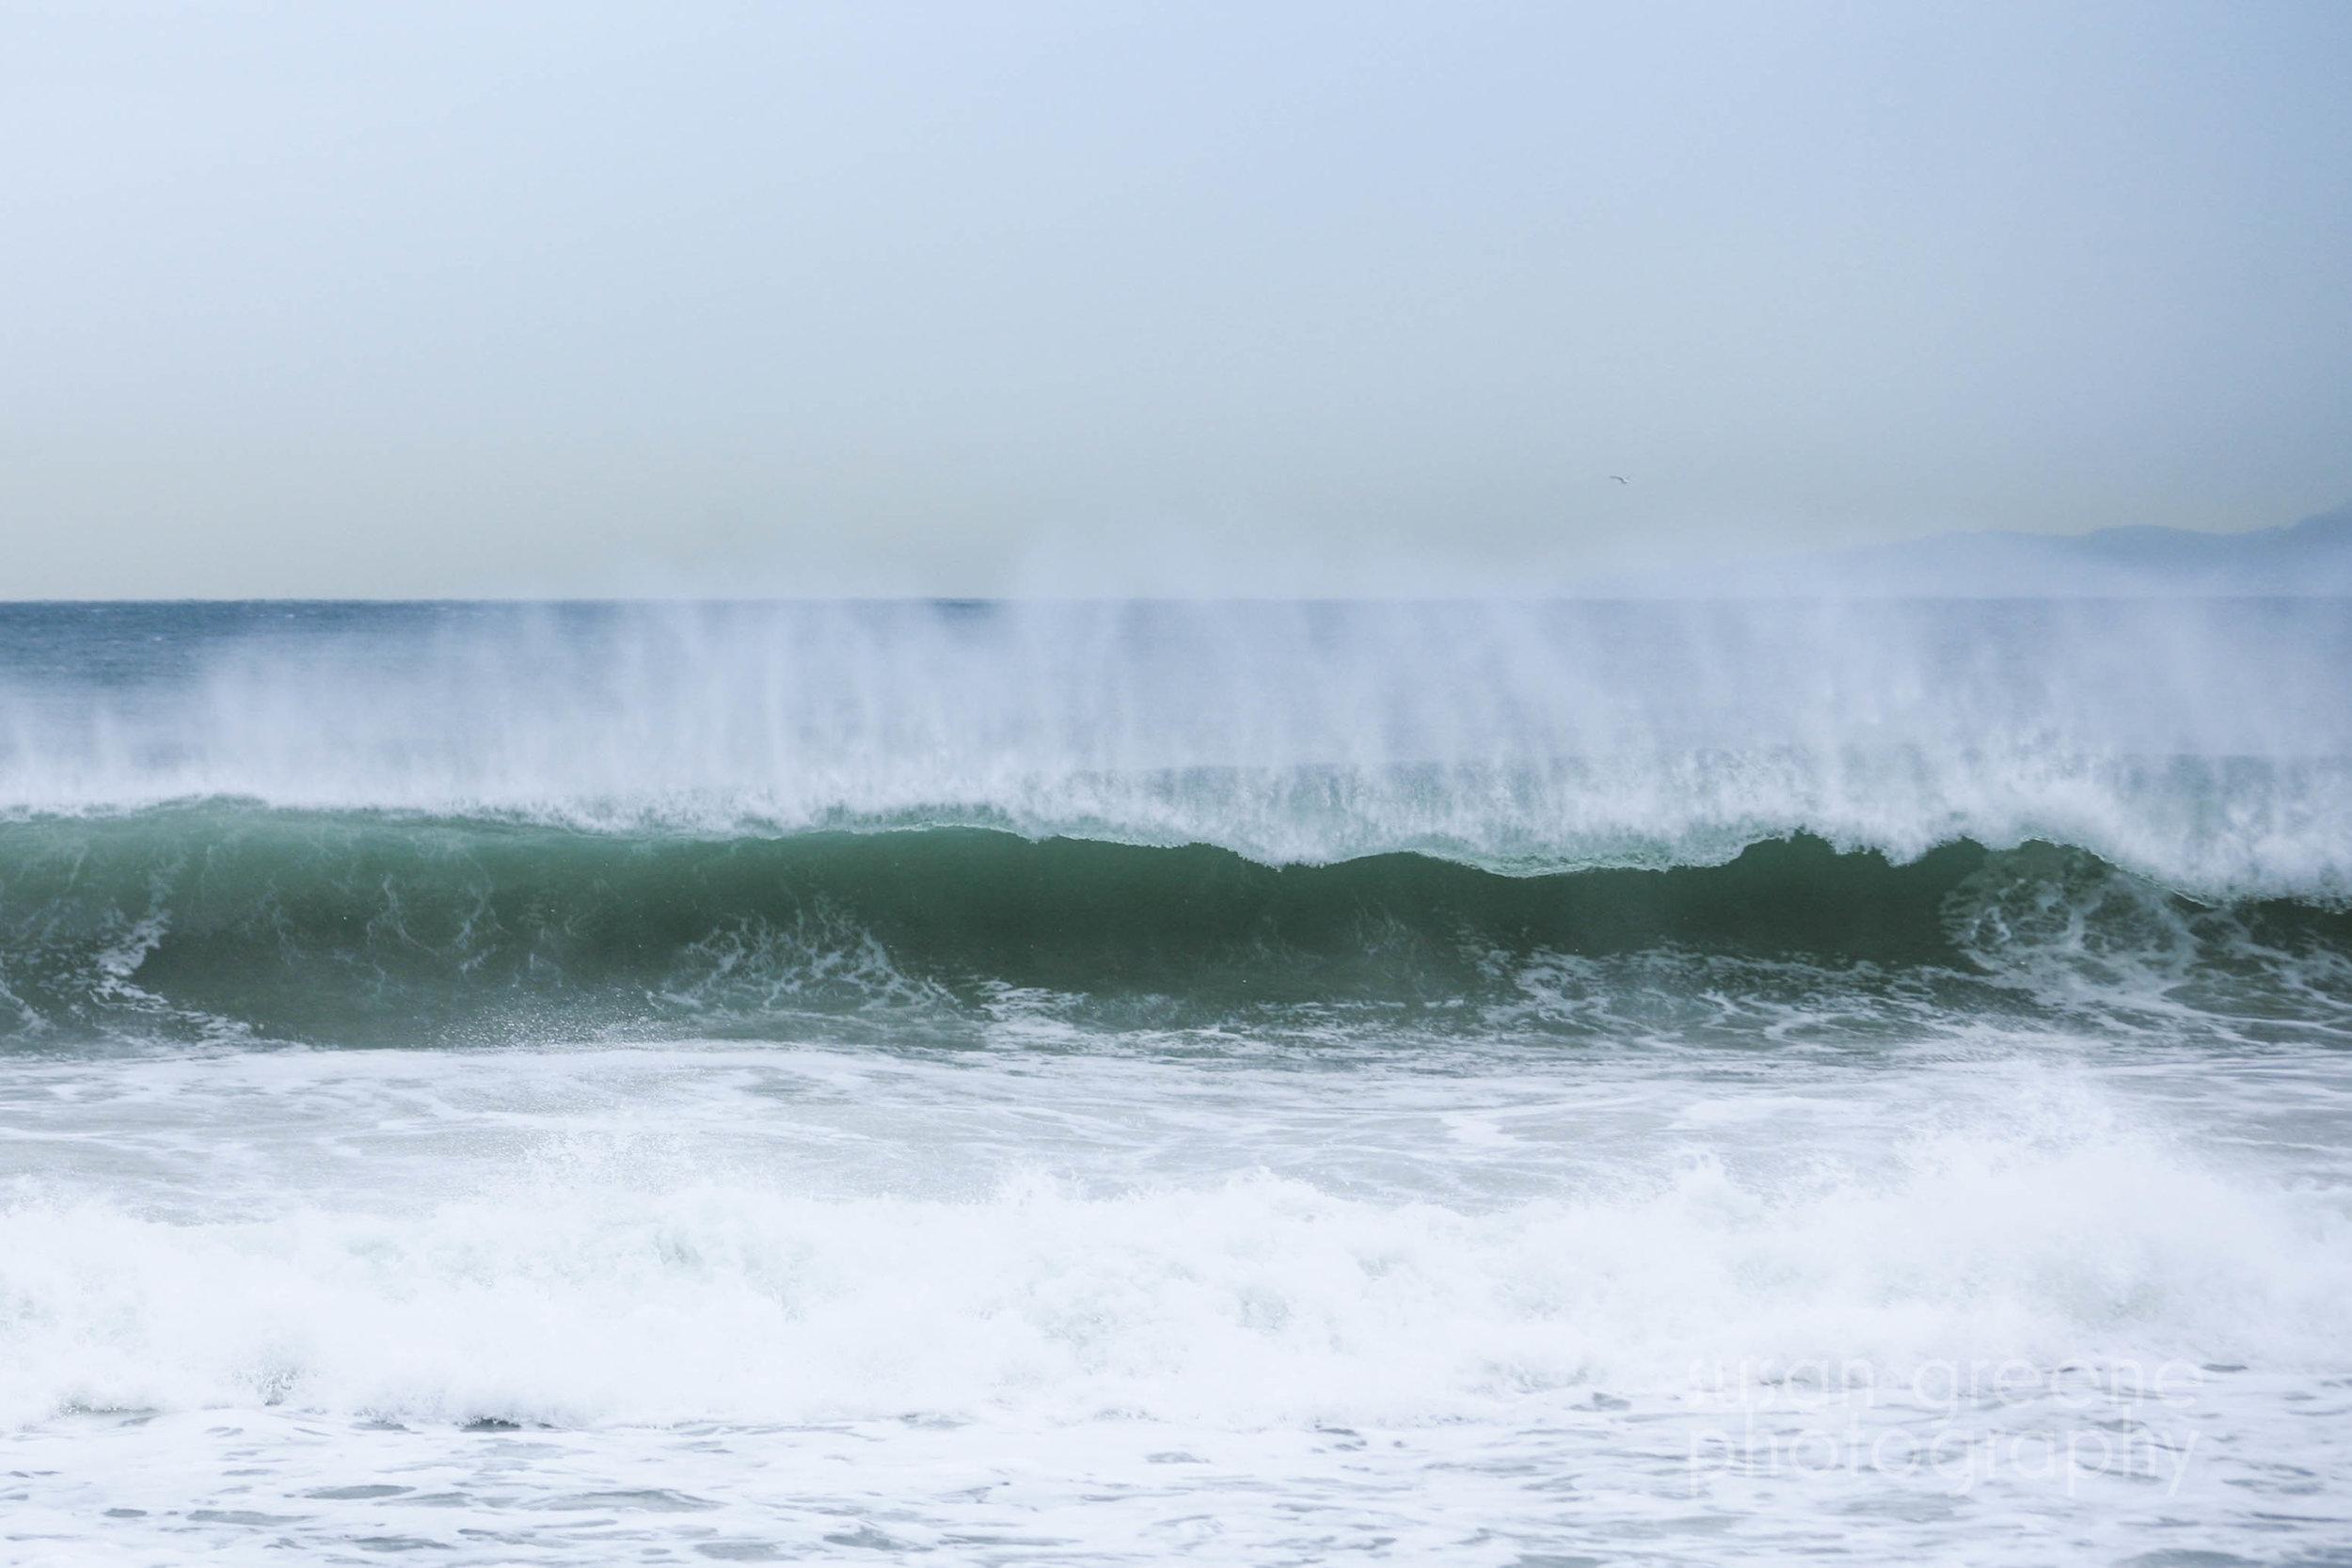 wave #5